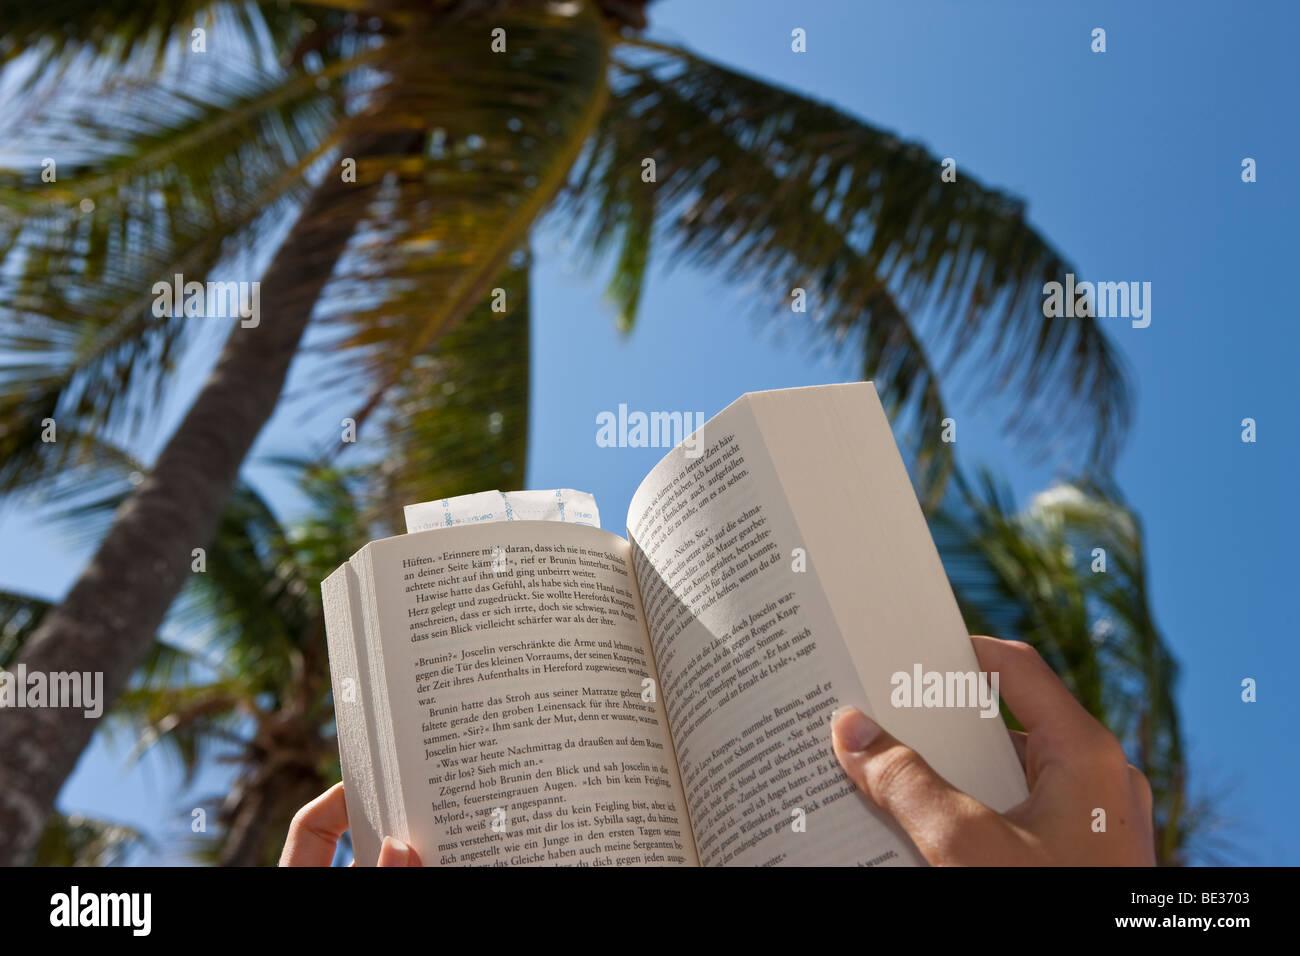 Frau am Strand ein Buch unter Palmen Stockbild